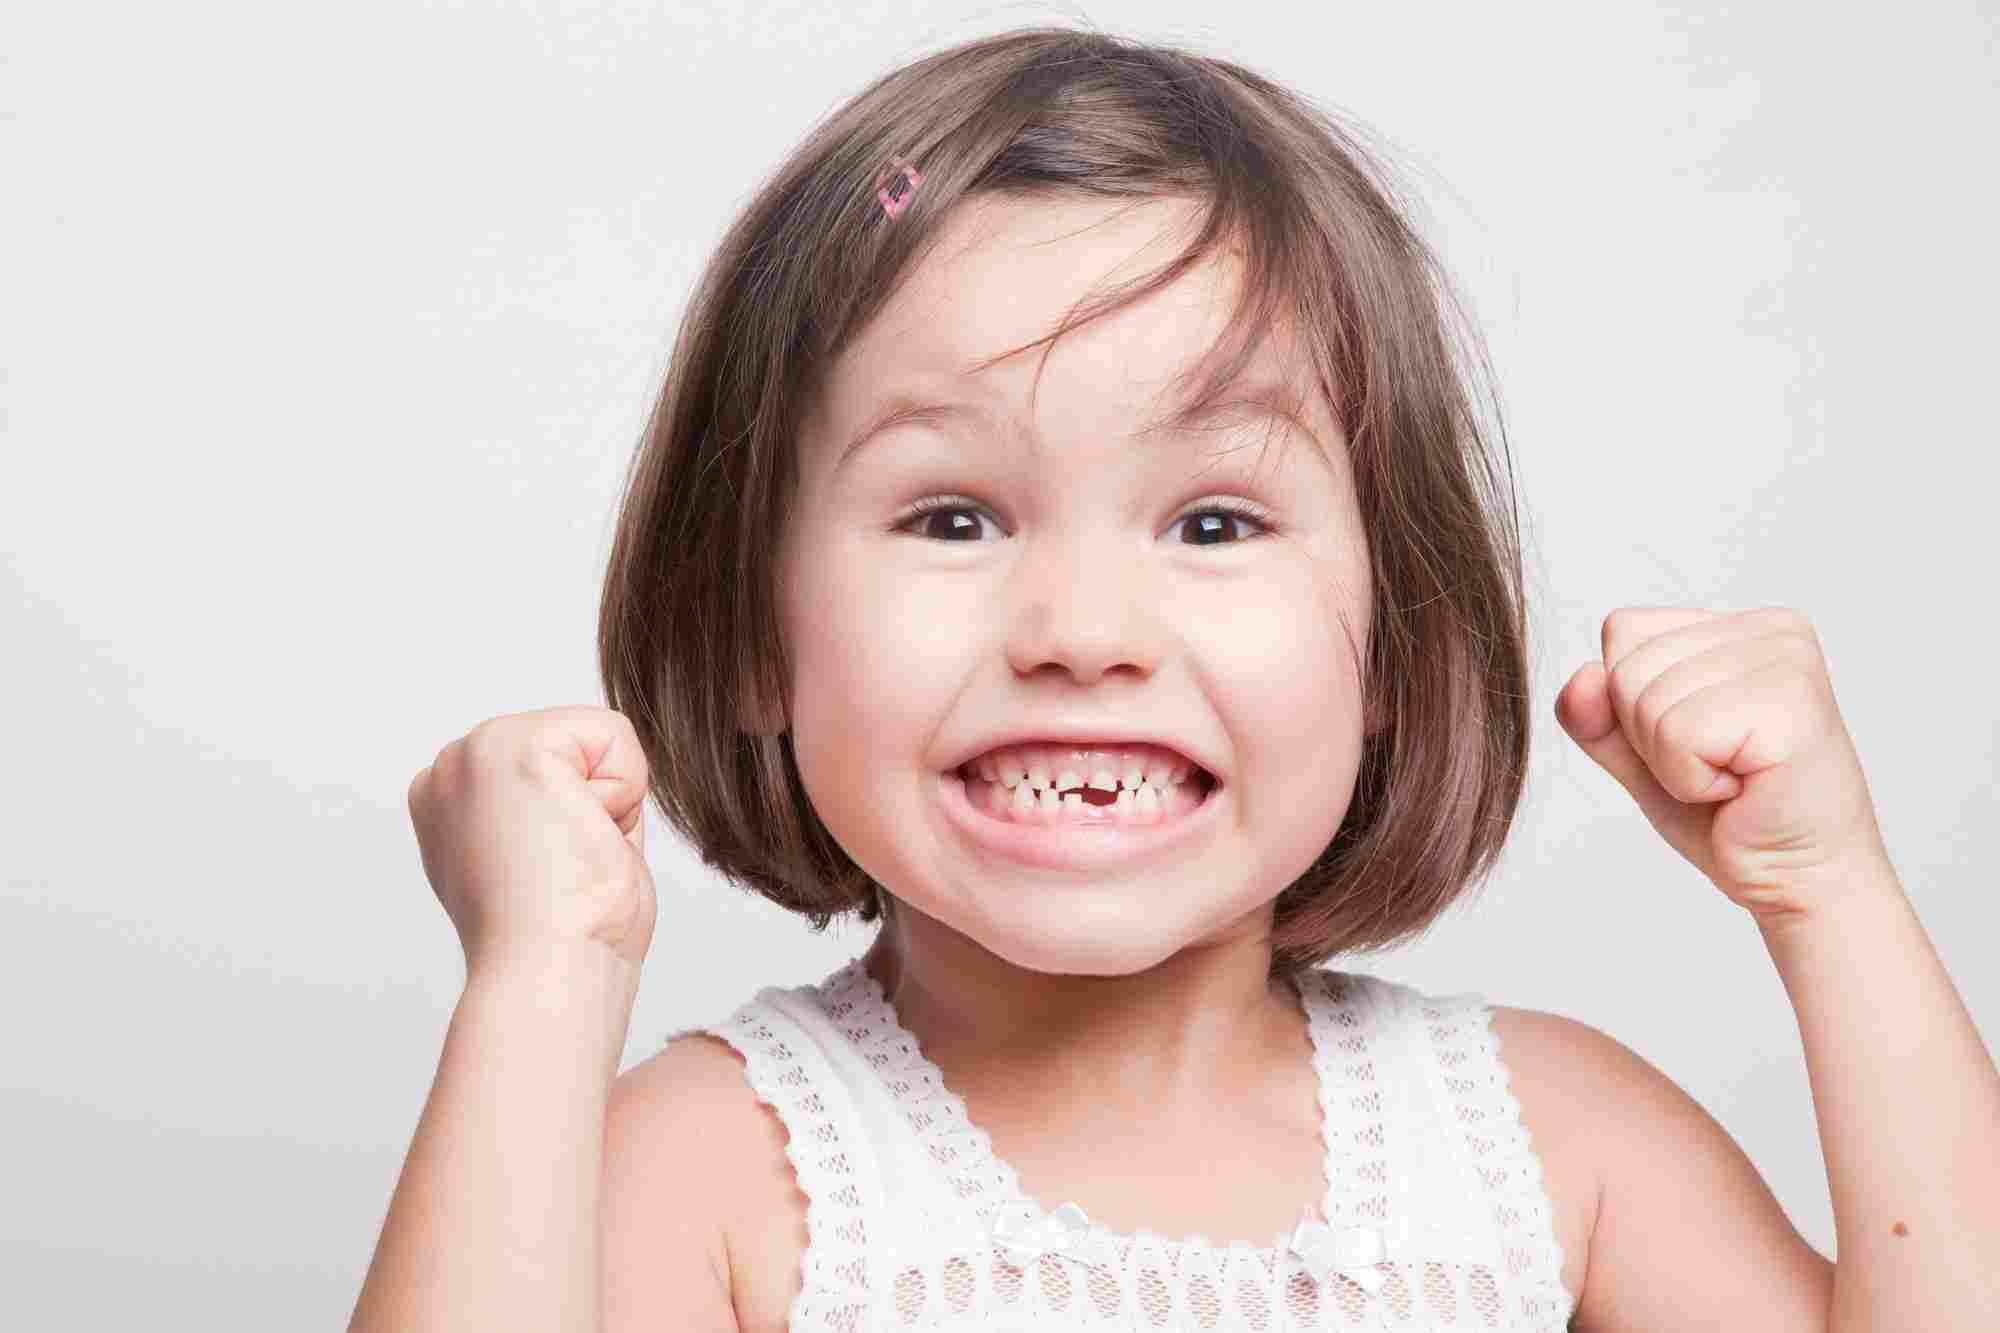 Justin Tebbenkamp DDS - Blacksburg Dentist -Teeth Sealants